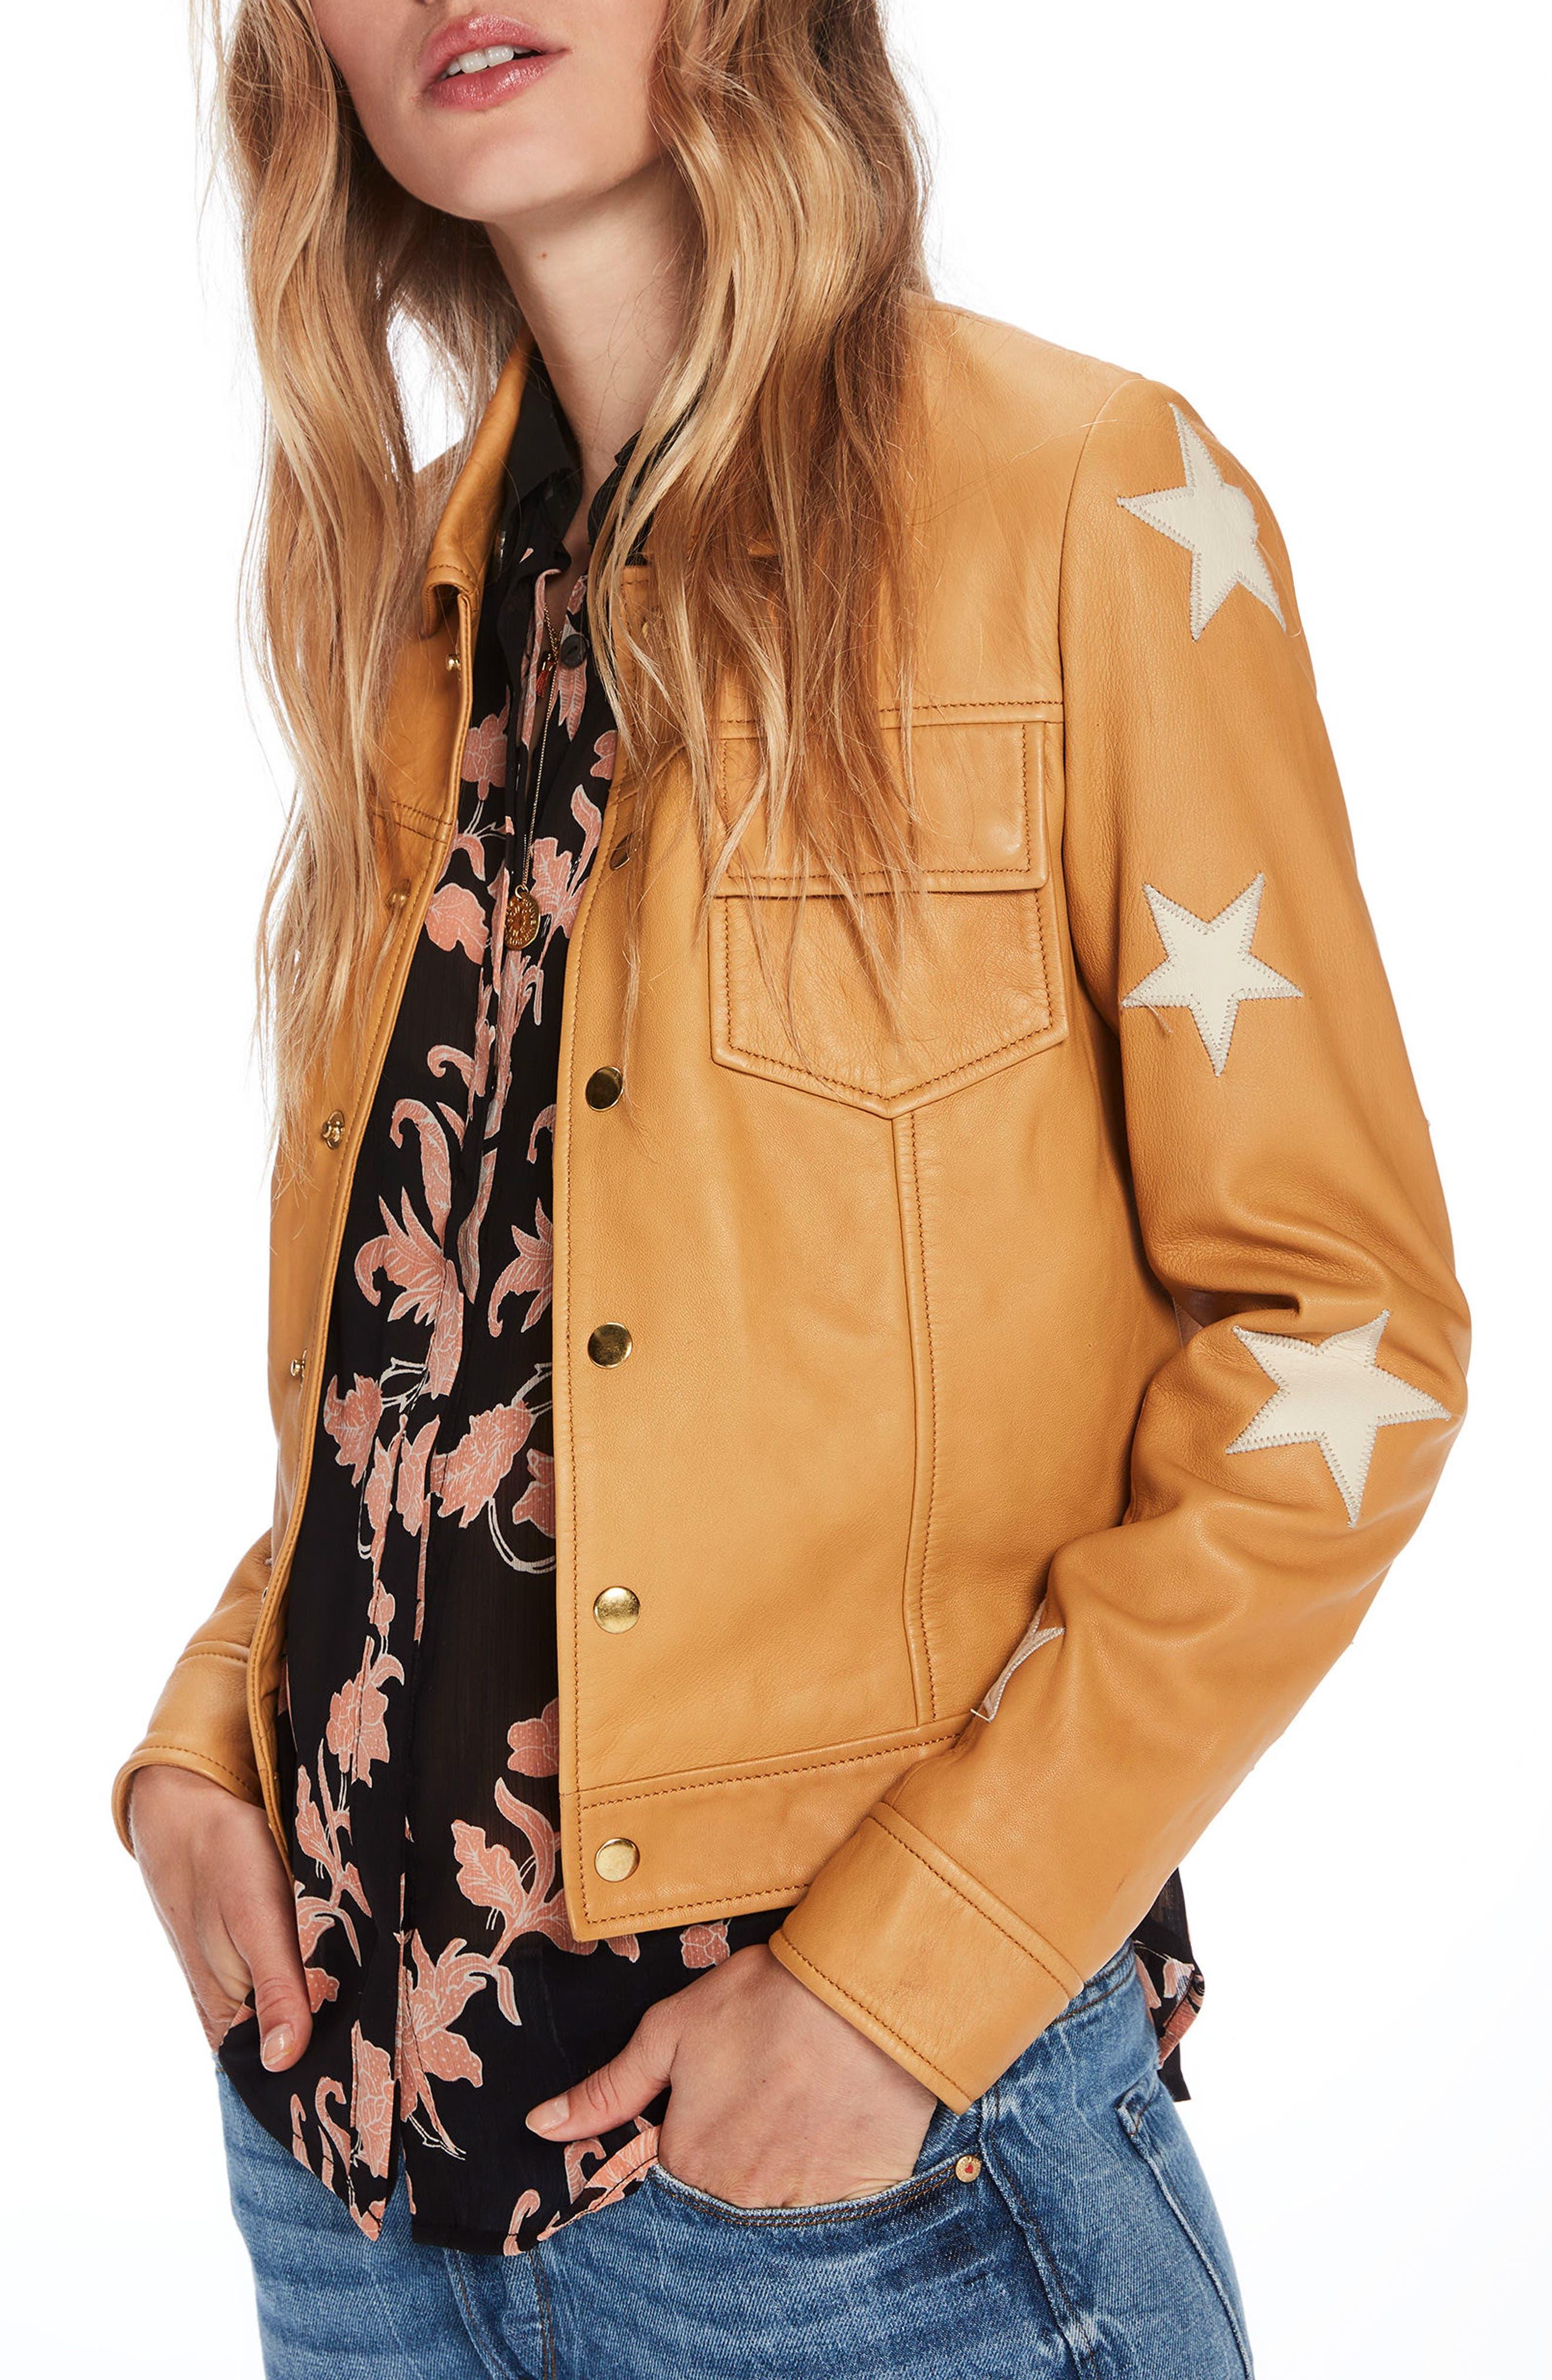 Sheepskin Leather Shirt Jacket,                             Alternate thumbnail 3, color,                             Color 1942 Sahara